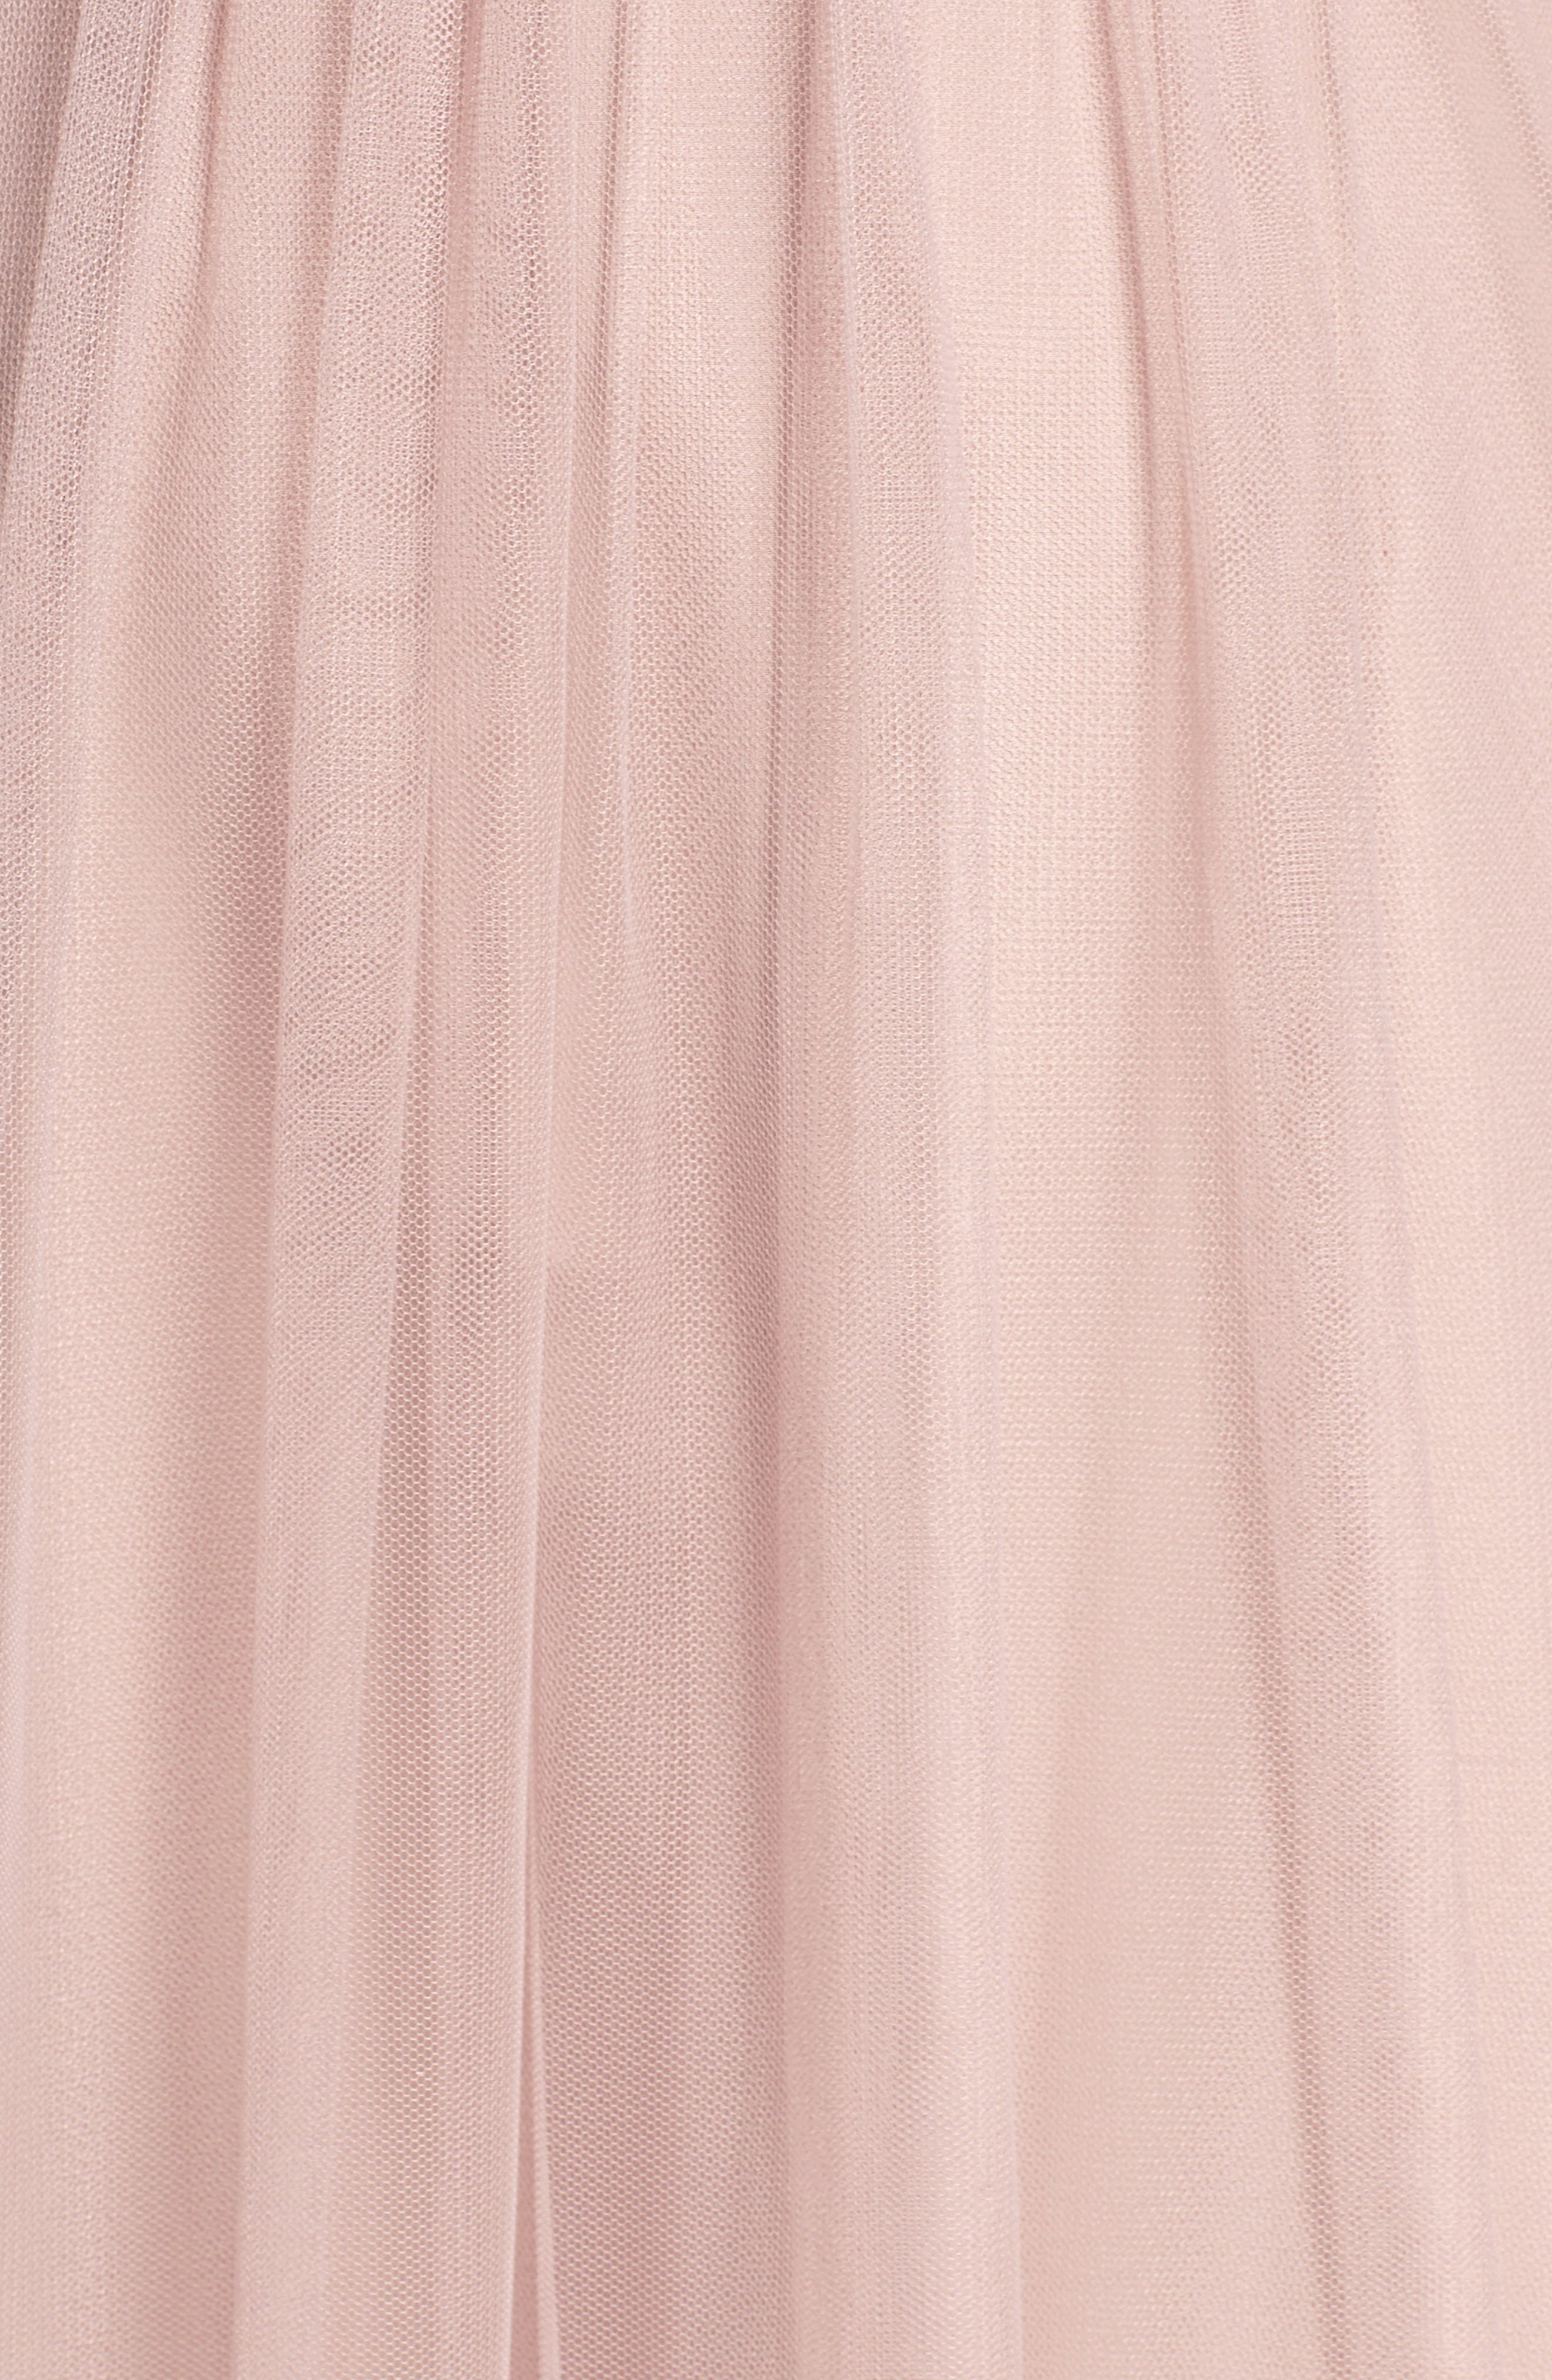 Strapless Tulle Gown,                             Alternate thumbnail 5, color,                             Latte